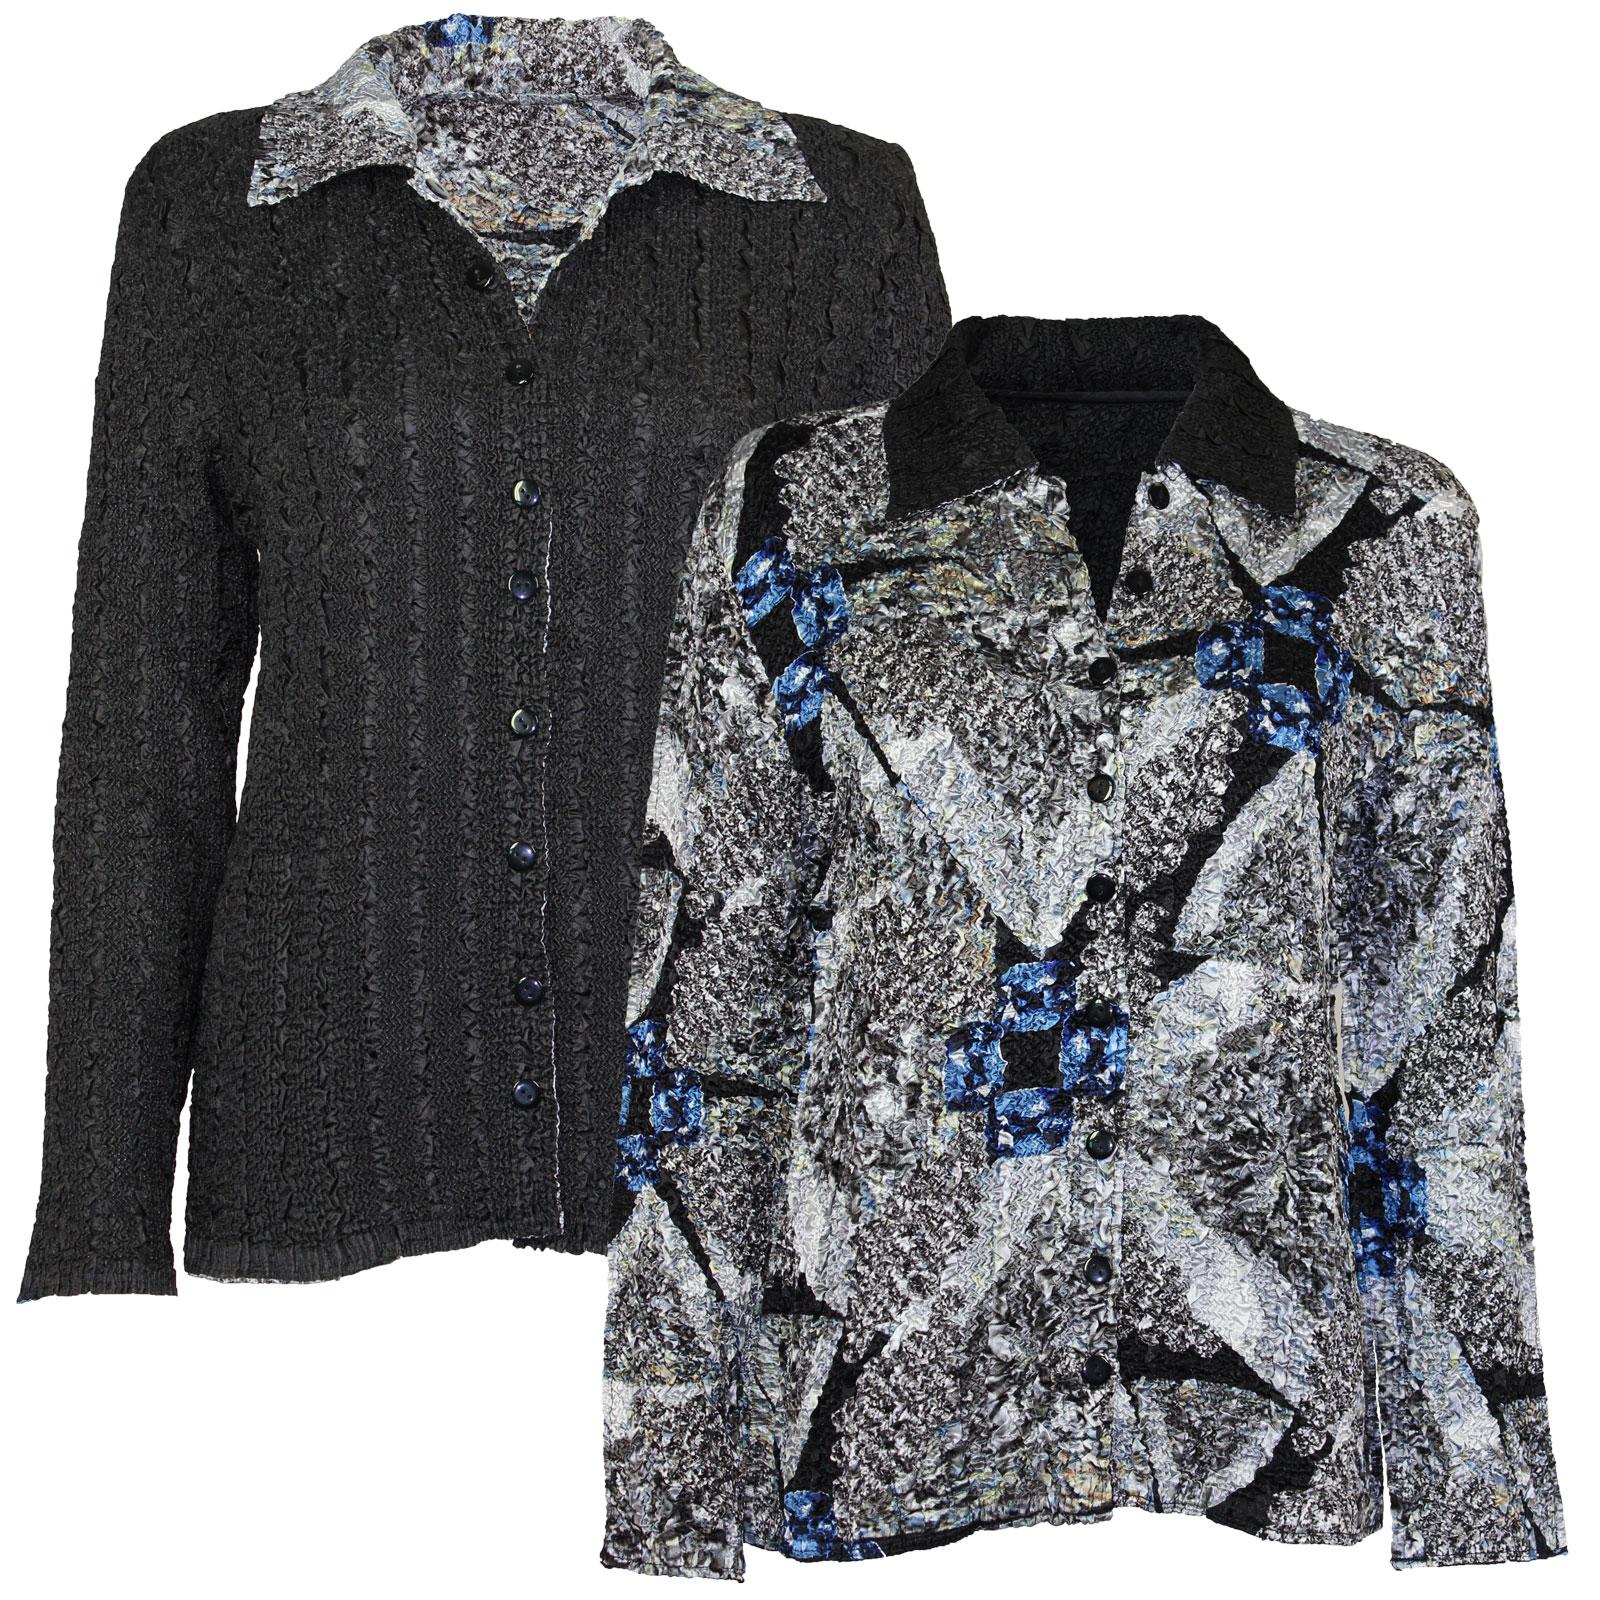 Wholesale Magic Crush - Reversible Jackets #14012 Black, Grey and Blue Print - 1X-2X